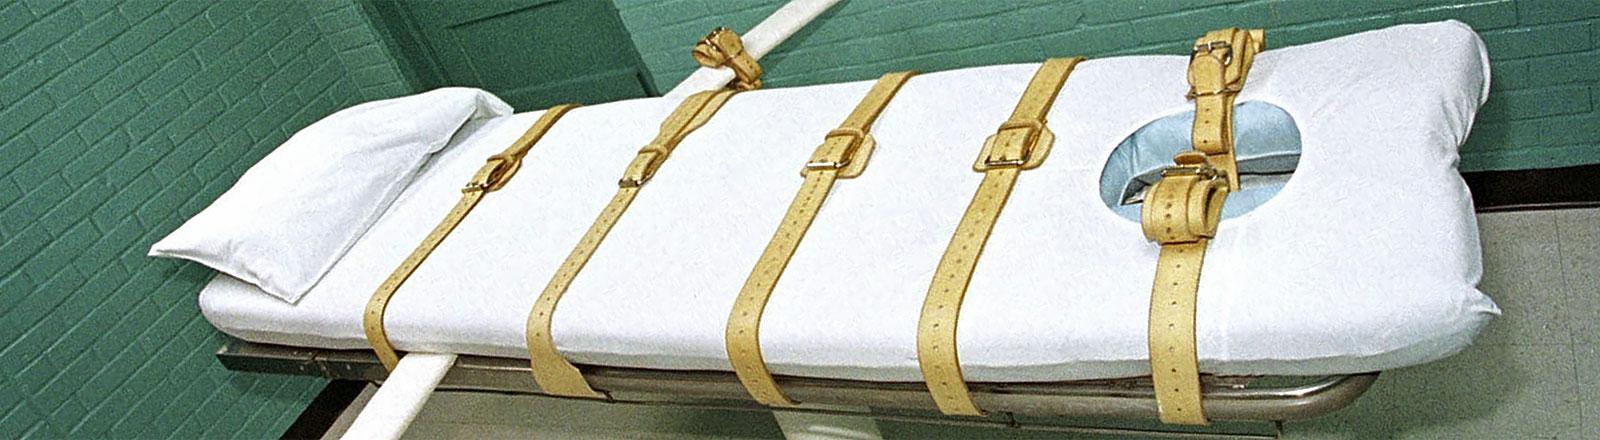 Todeszelle des Huntsville-Gefängnisses in Texas